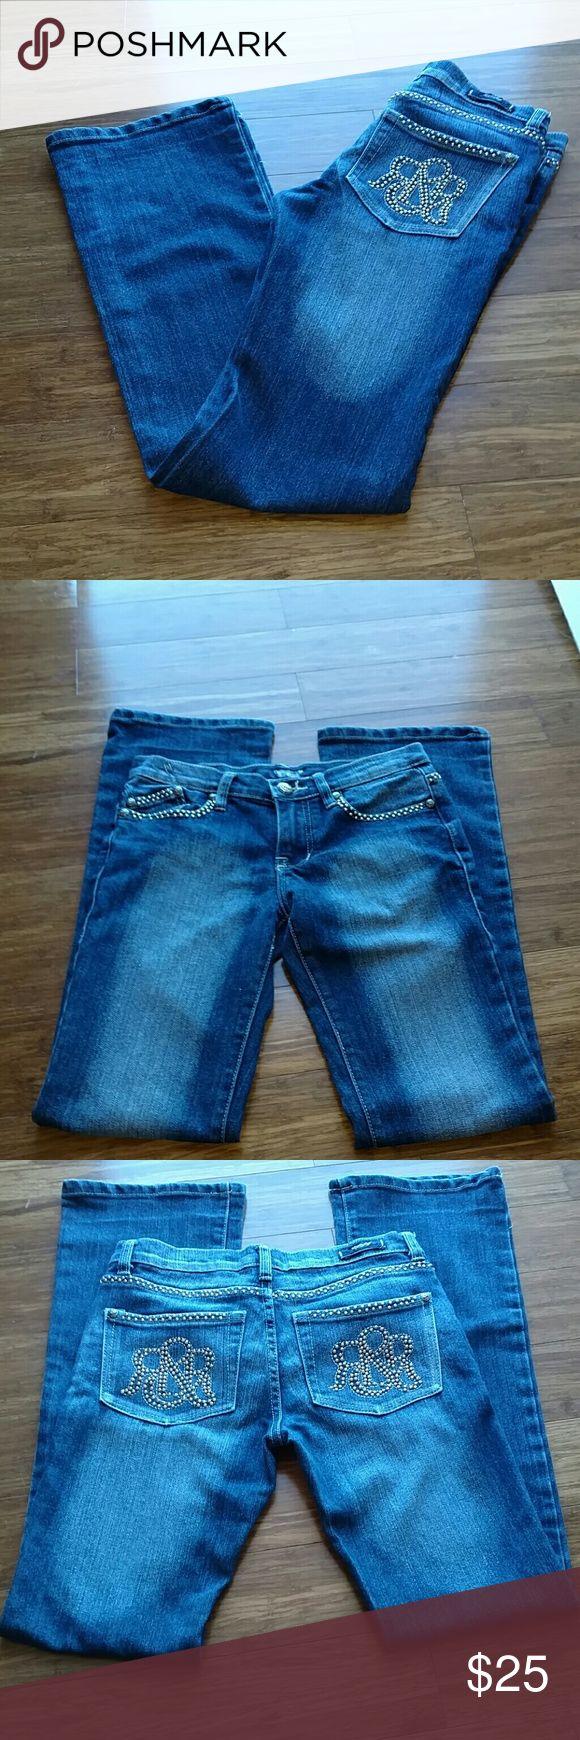 Rock & Republic No Flaws very nice straight leg size 27 made in U.S.A Rock & Republic Jeans Straight Leg